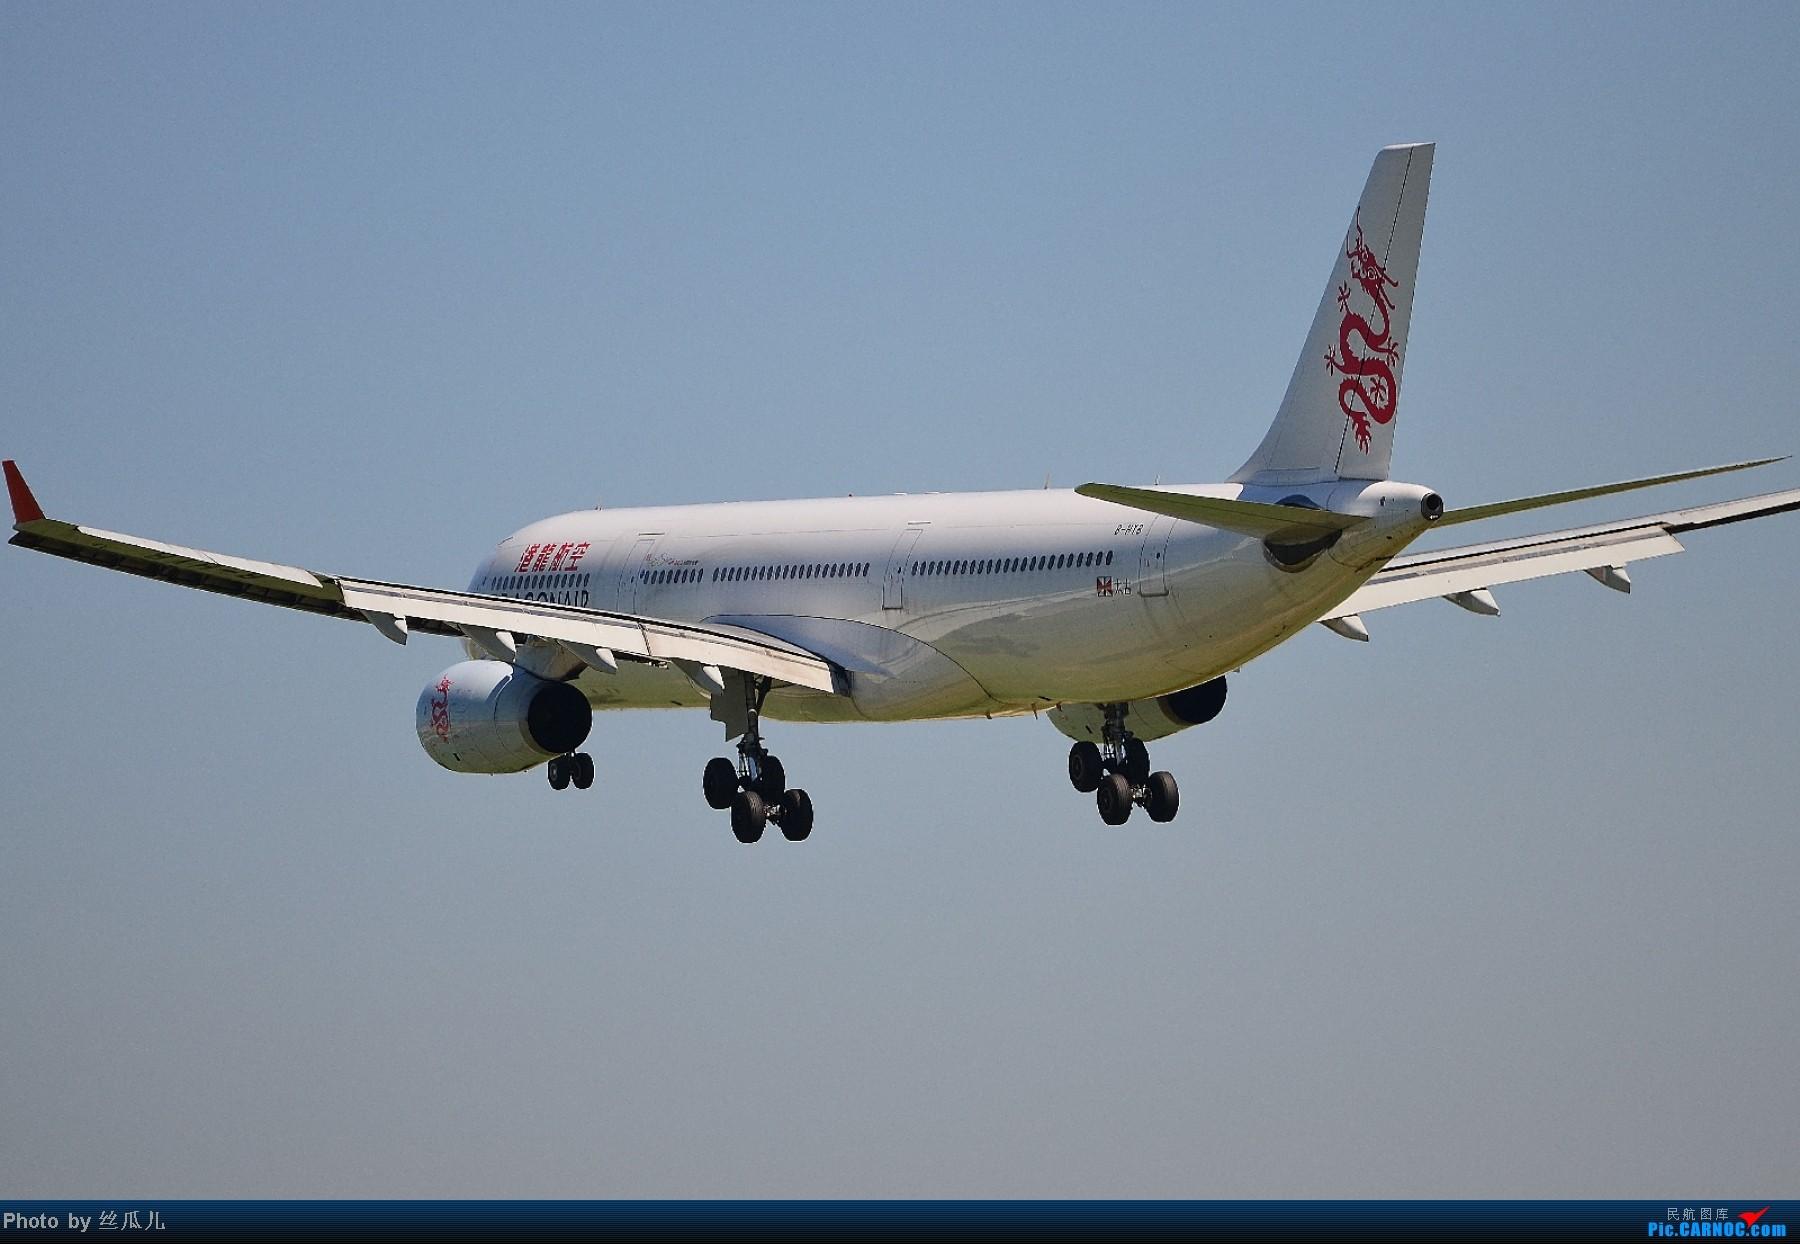 Re:[原创]长途奔袭鸟窝所得,HGH-PEK-HGH,鸟窝上空在我登基前的最后时刻云开雾散,感谢国家!感谢首都人民!感谢飞友网!感谢新华网!感谢CCTV!! AIRBUS A330-300 B-HYB 中国北京首都机场